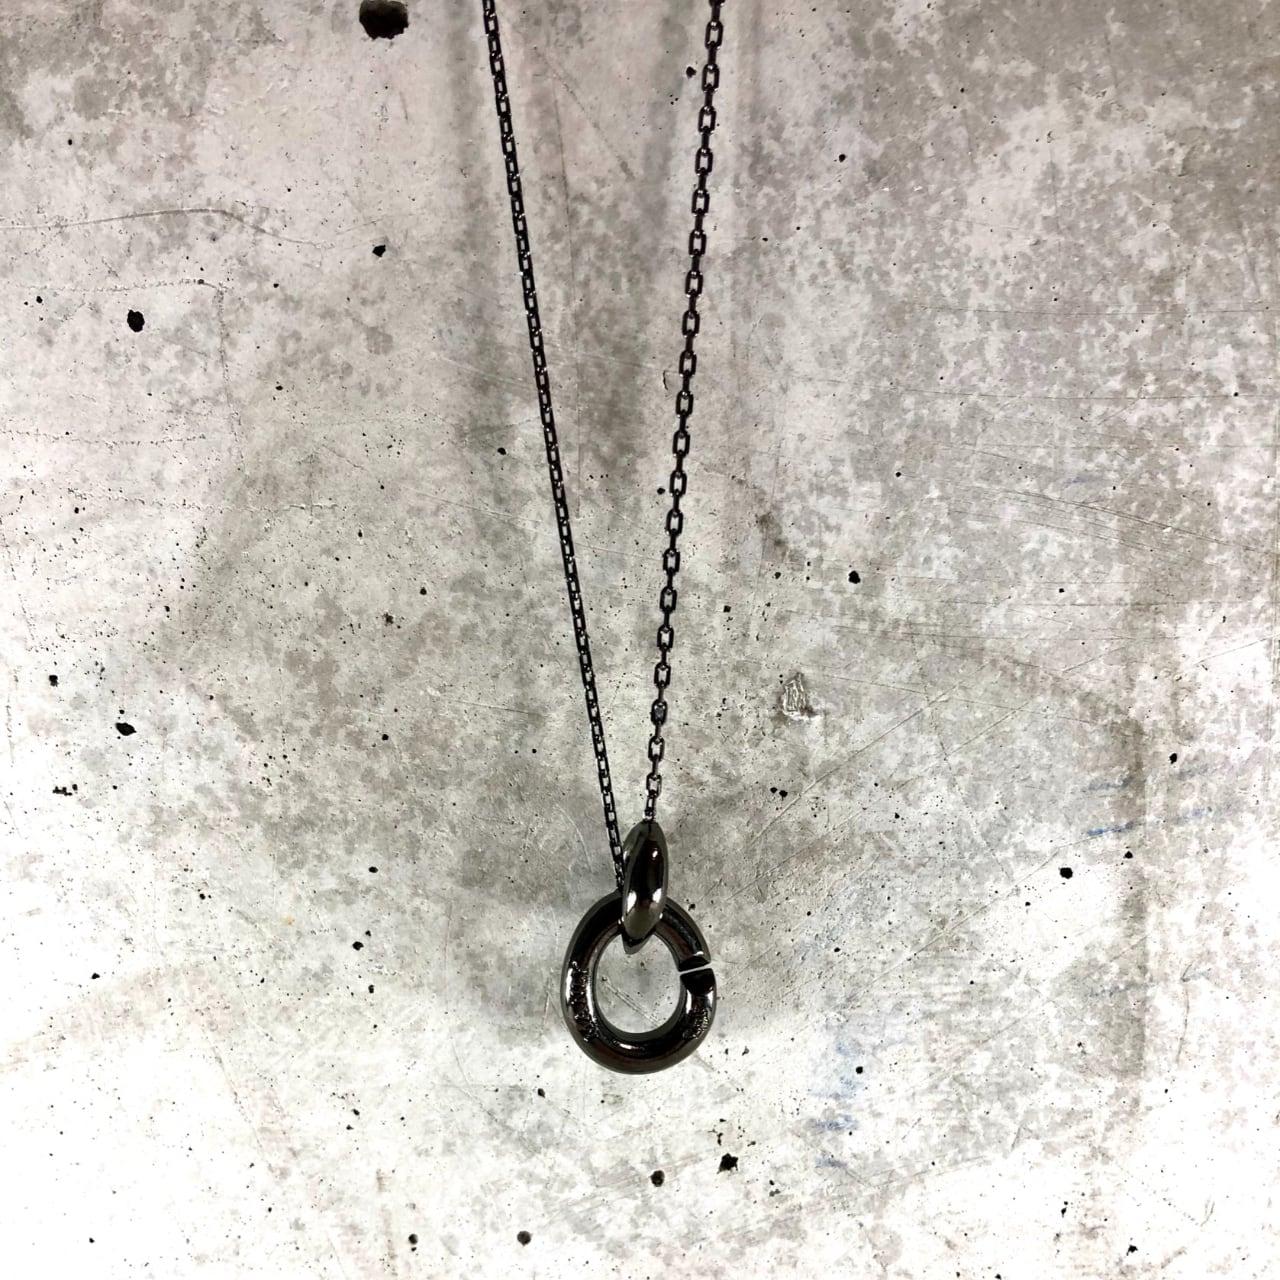 【MN-13BR】Oval black plating pendant